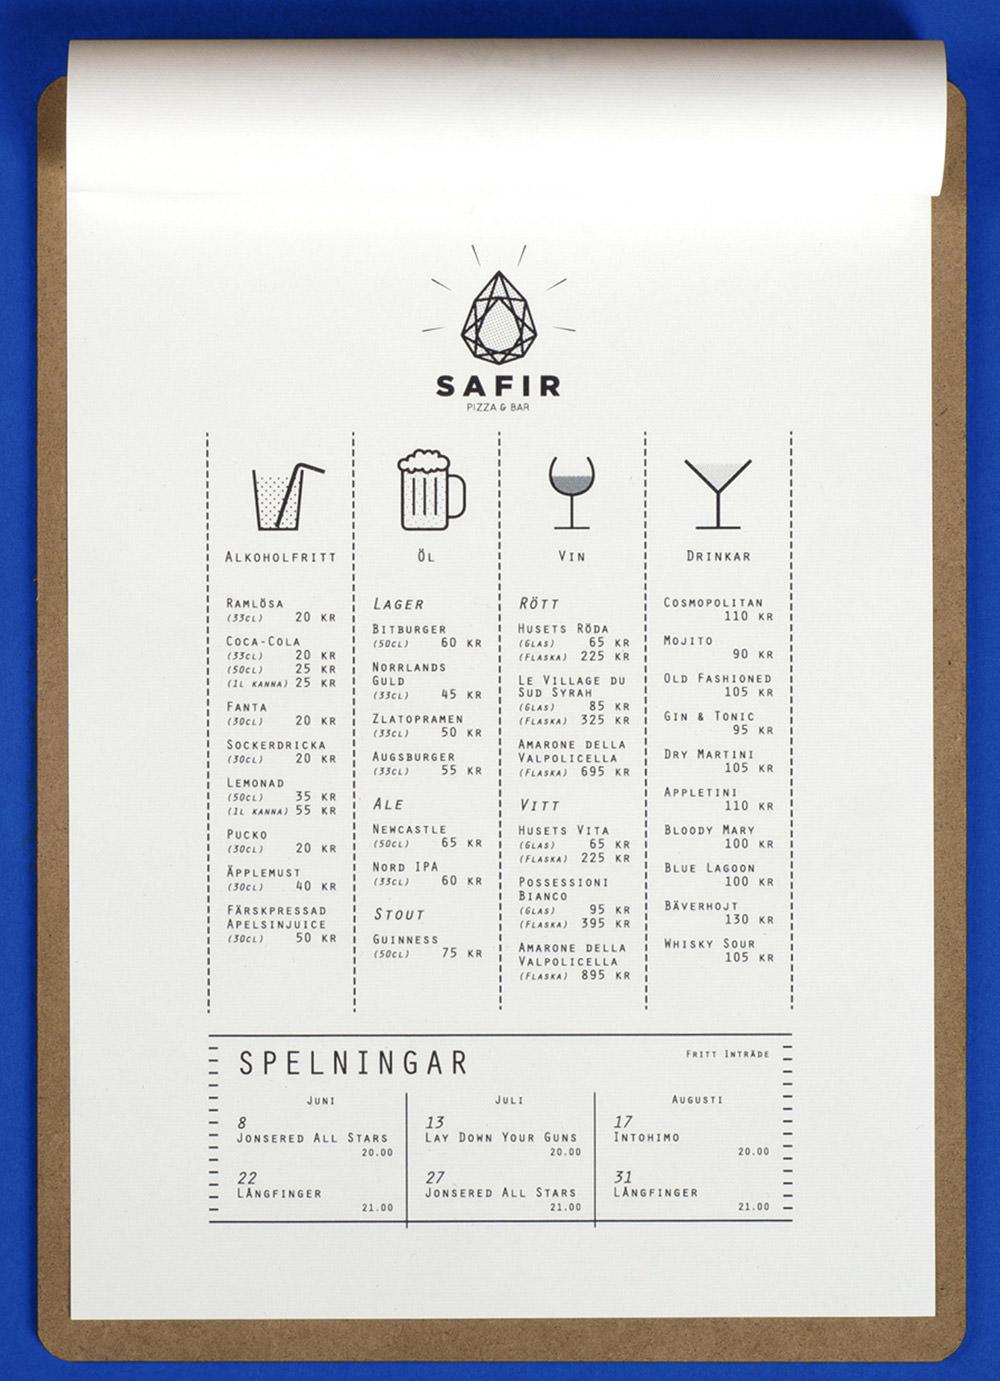 Safir Pizza And Bar Menu by Tomas Moller